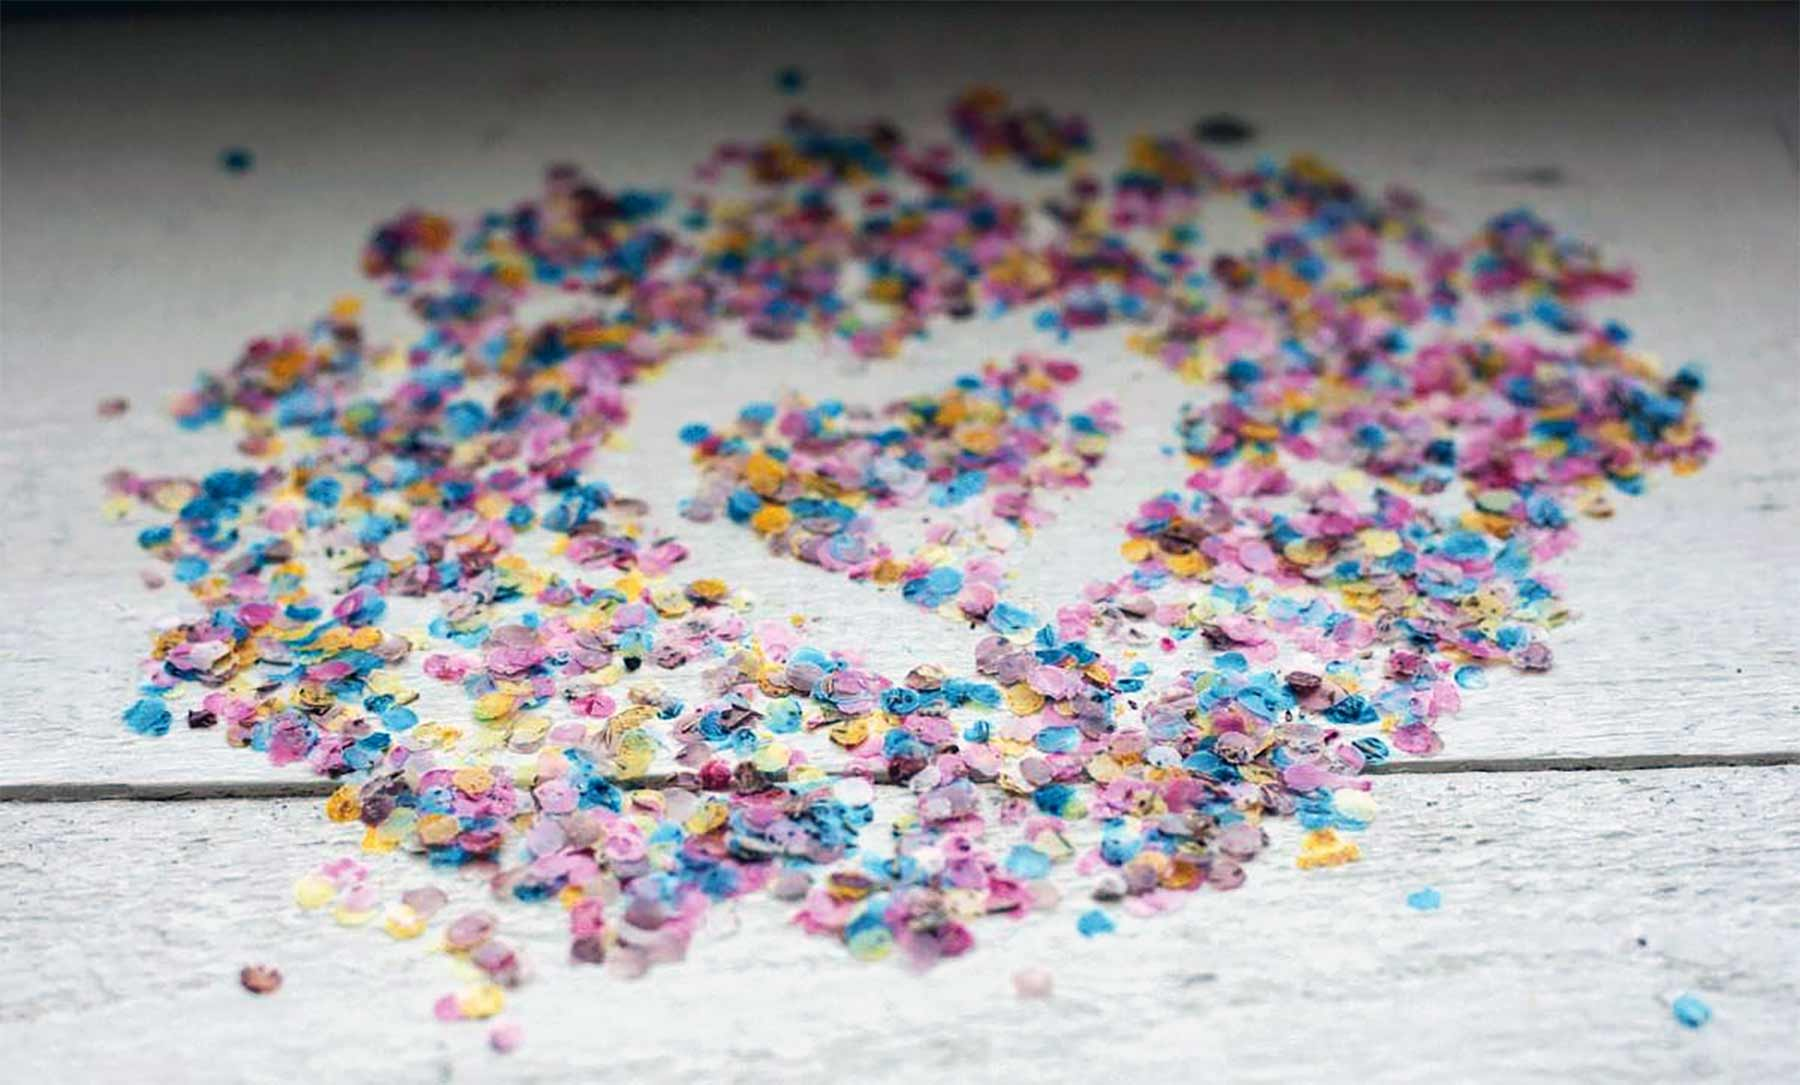 Gute Laune-Sache: Saatgutkonfetti